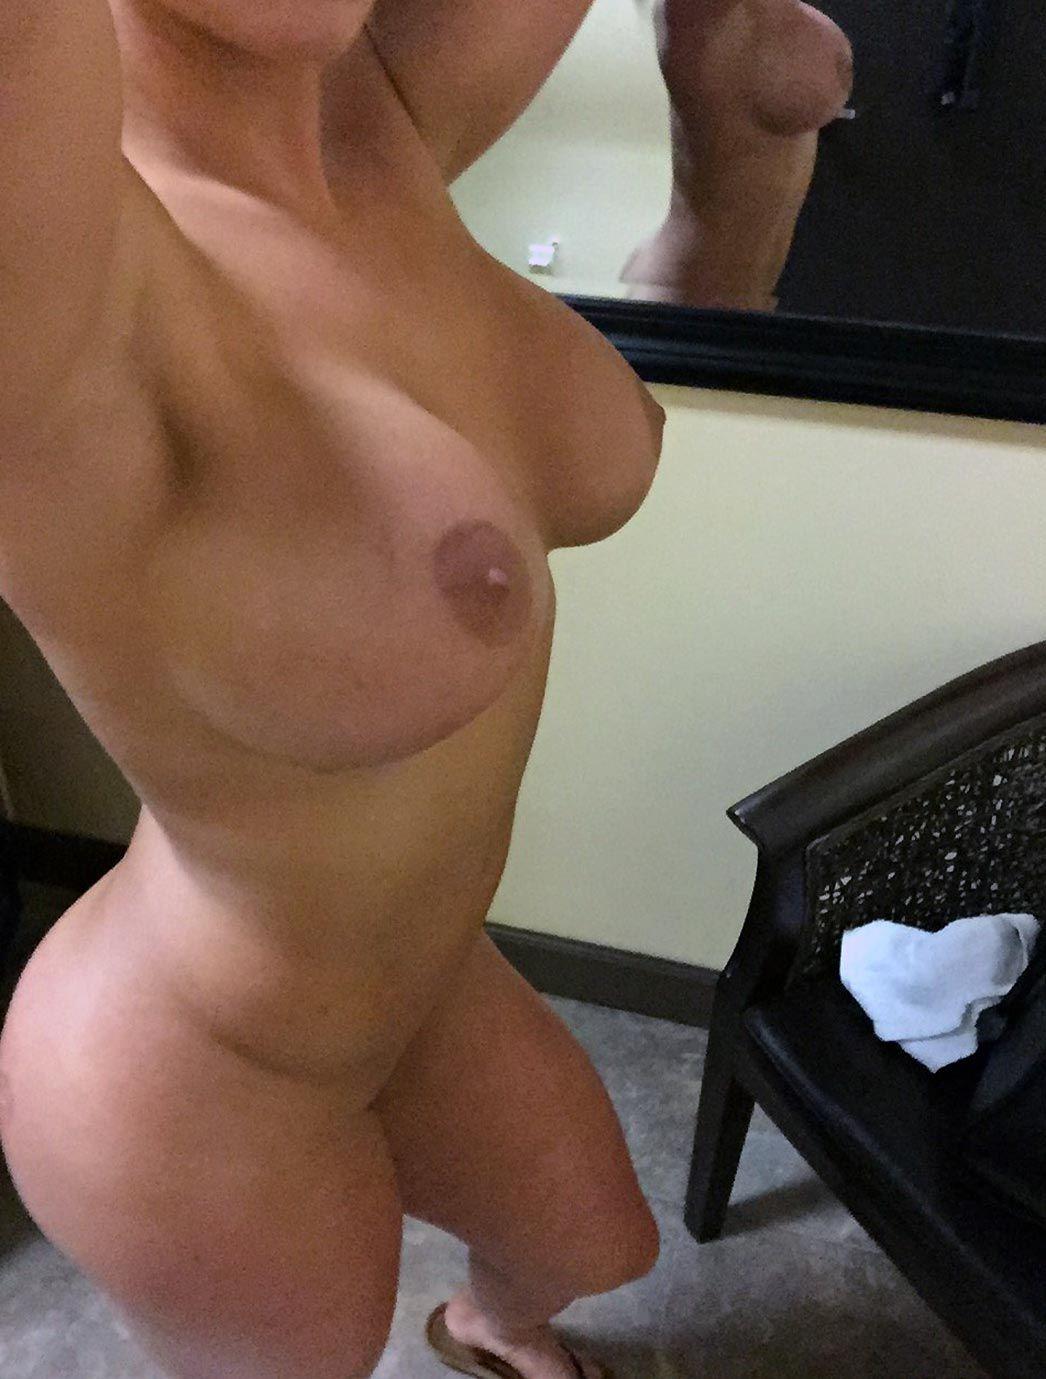 Celeste Bonin Nude Leaked The Fappening & Sexy 0260